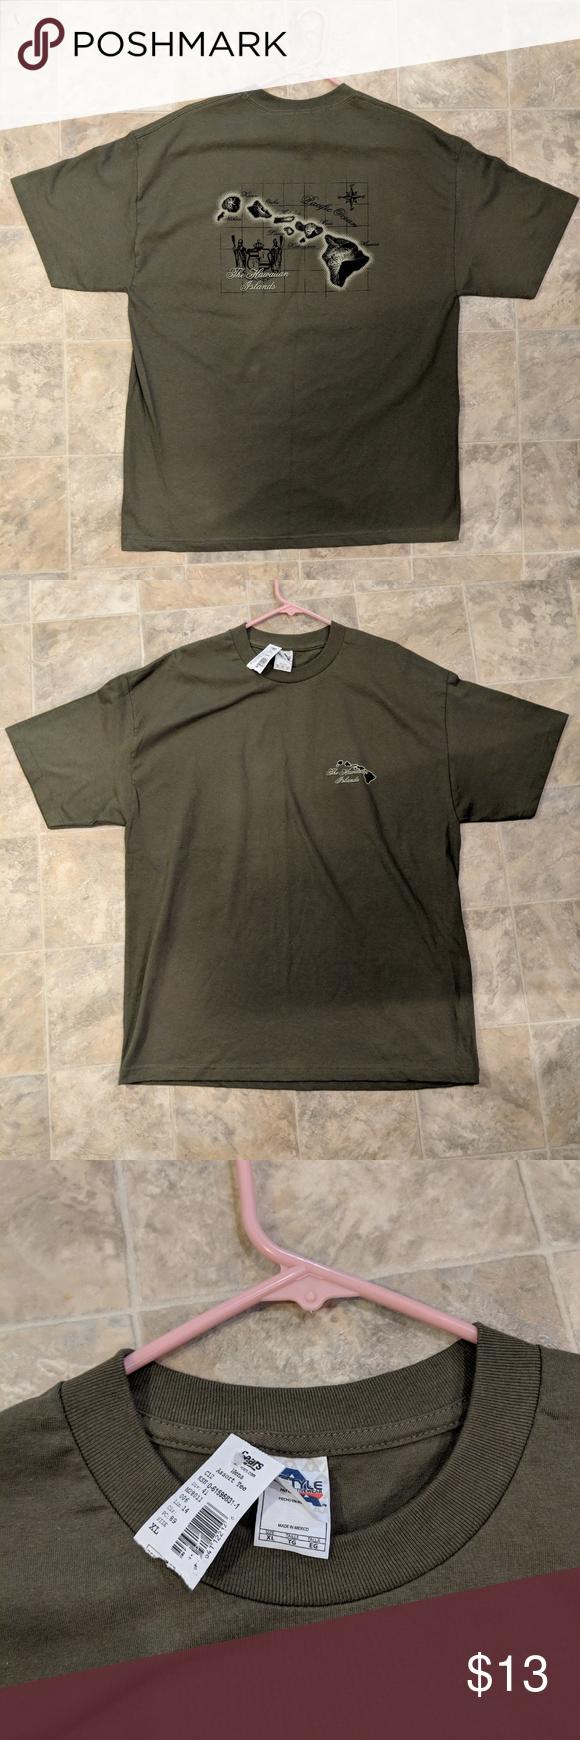 New Alstyle Hawaii Men S Xl Green Short Sleeve Long Sleeve Tshirt Men Alstyle Apparel Green Shorts